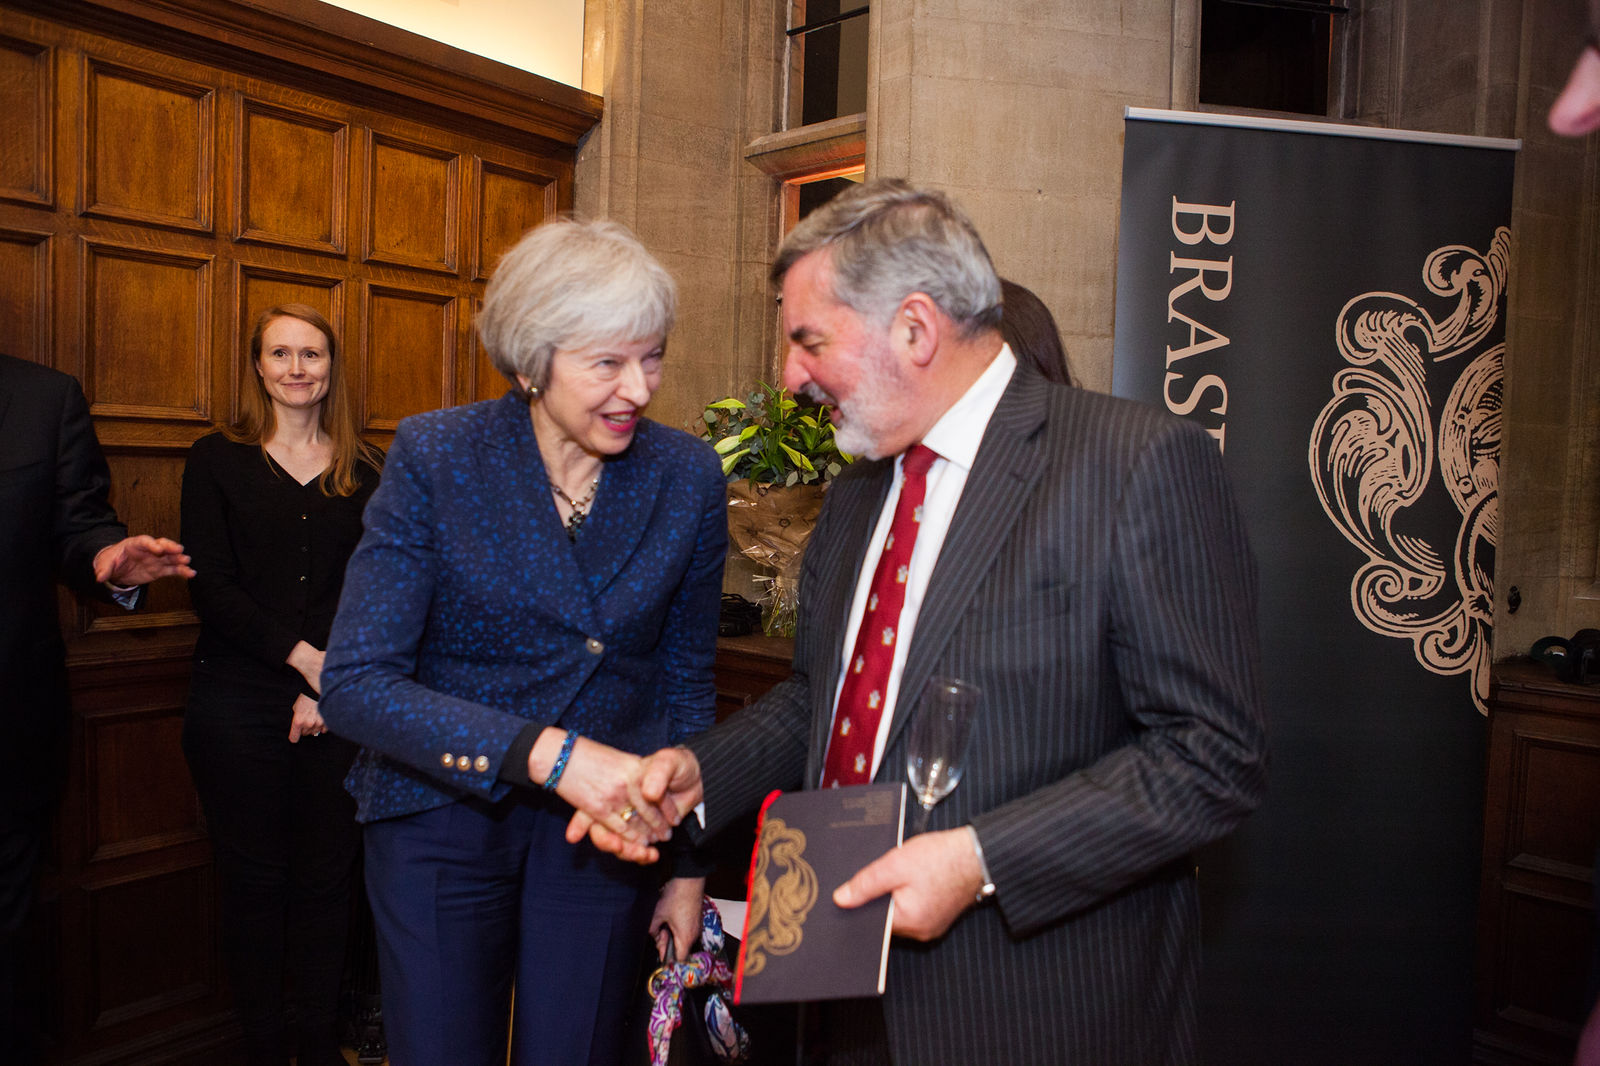 The Rt Hon Mrs Theresa May and John Alderice